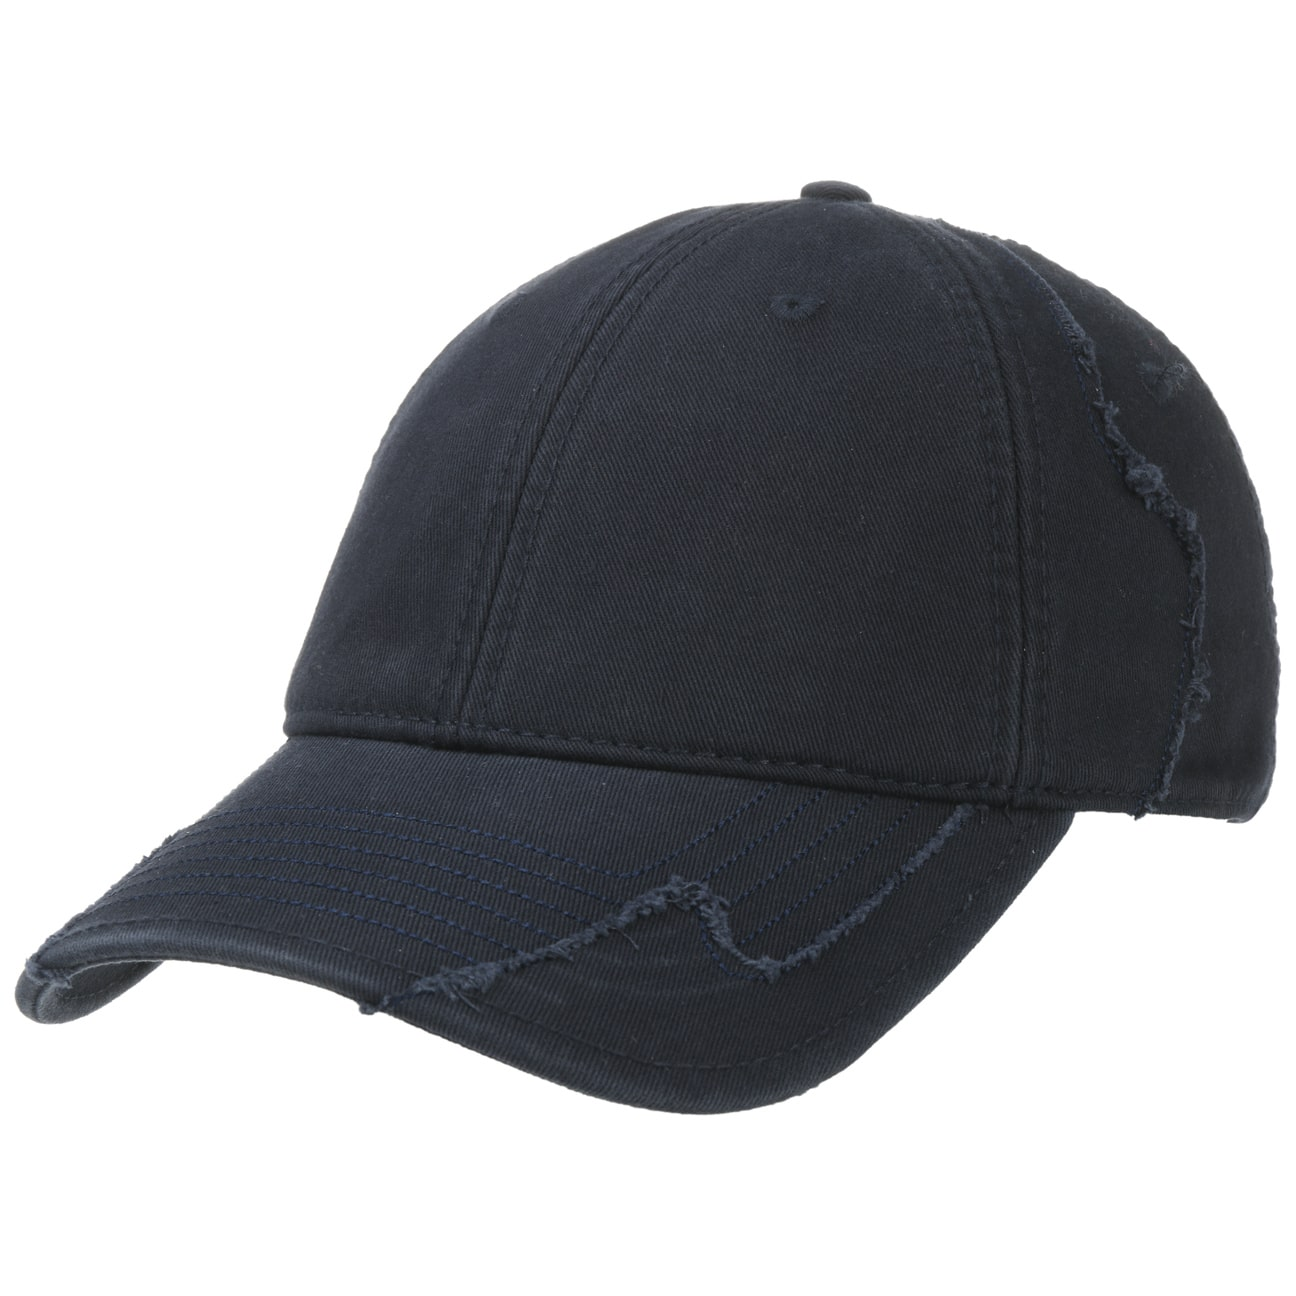 Gorra de Béisbol Destroying Hurricane - Gorras - sombreroshop.es 9bfb689cc35